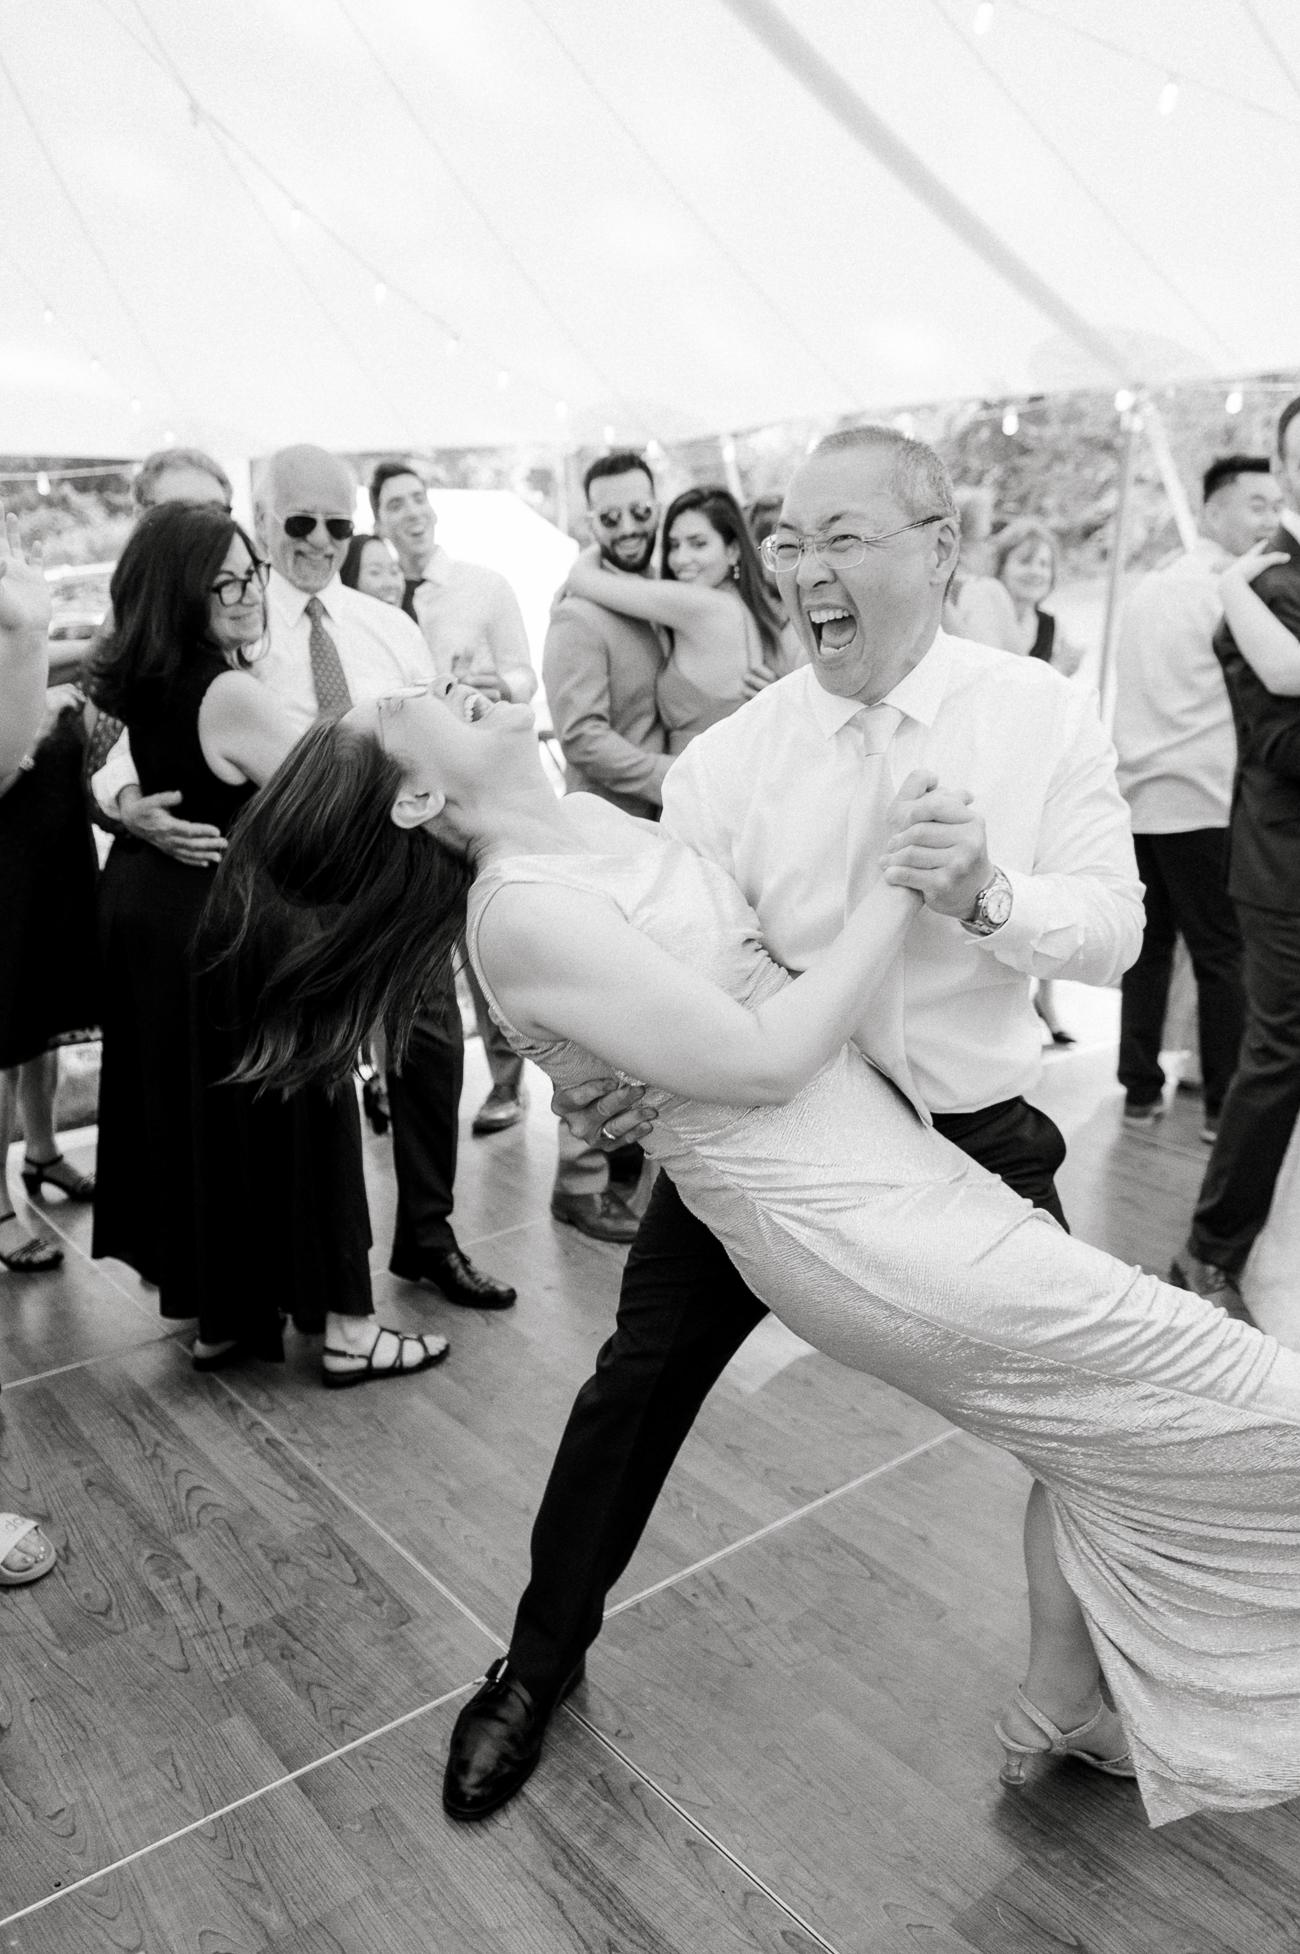 Bill dipping Judy on the dancefloor